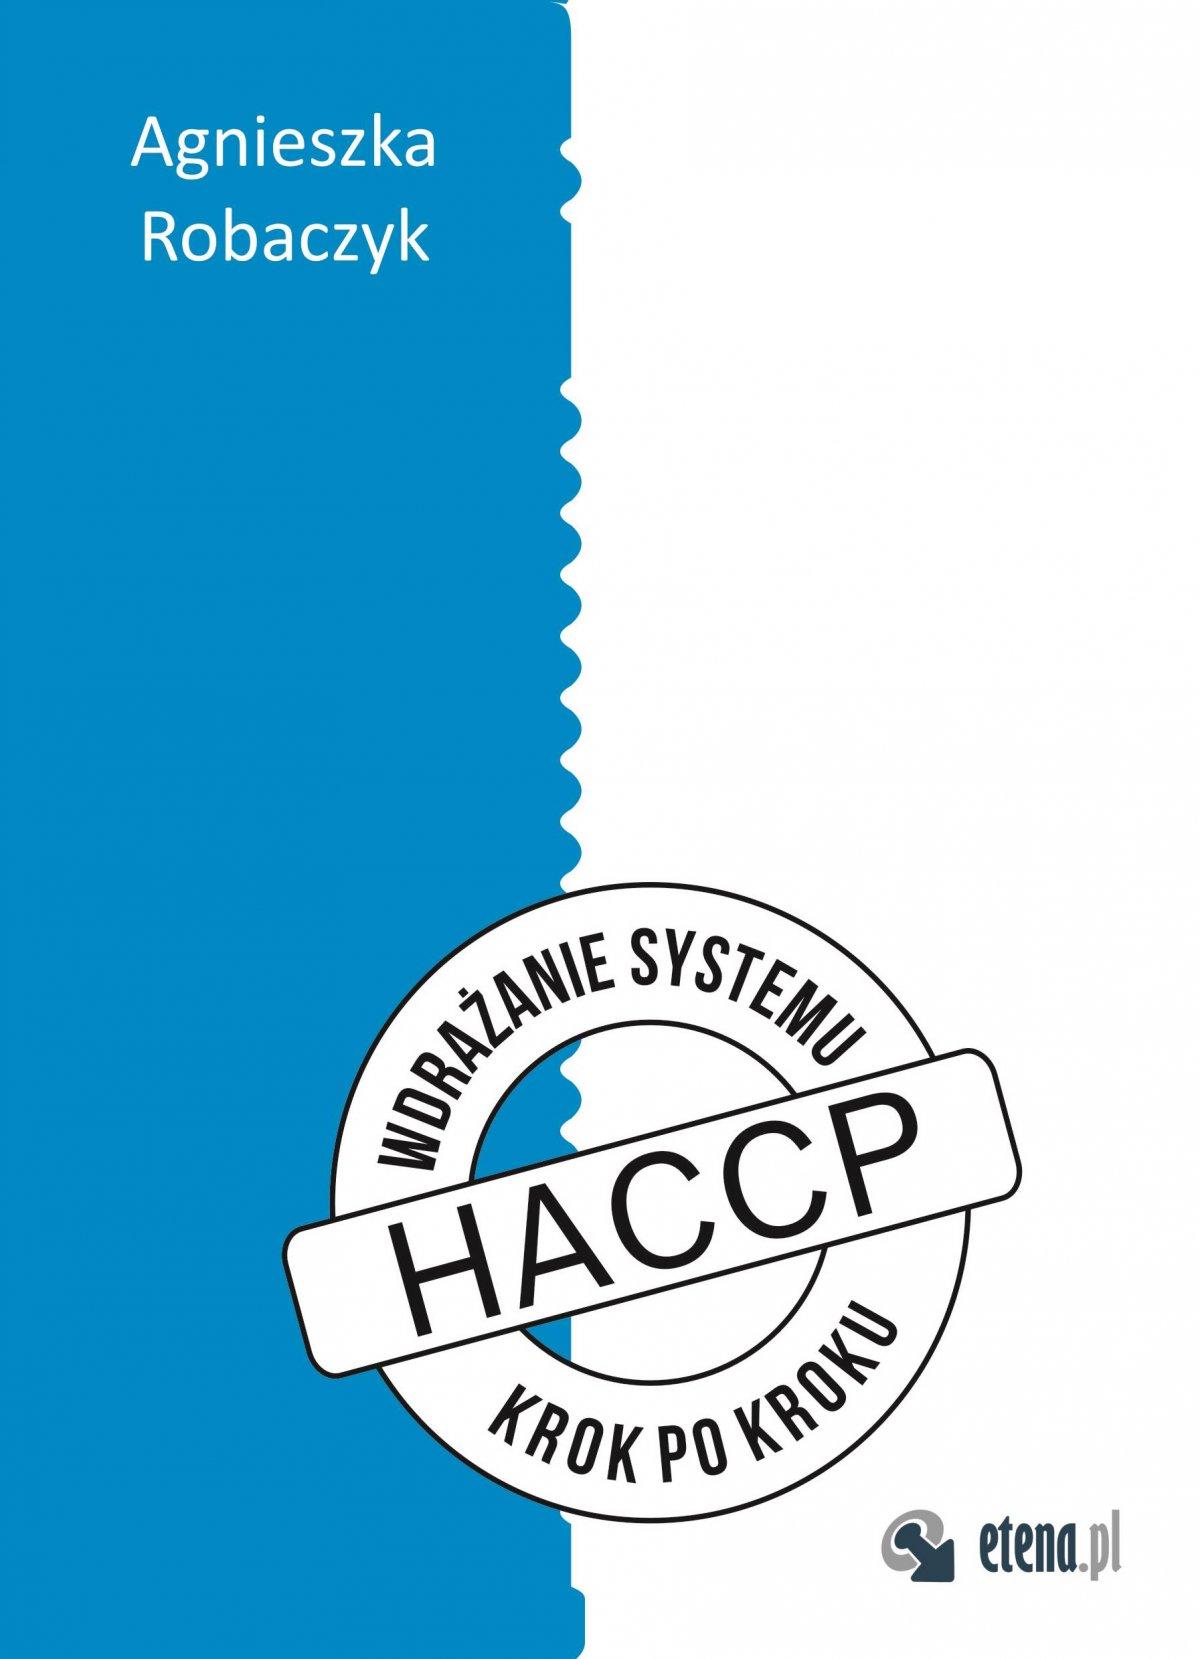 "Wdrażanie systemu HACCP ""krok po kroku"" - Ebook (Książka EPUB) do pobrania w formacie EPUB"